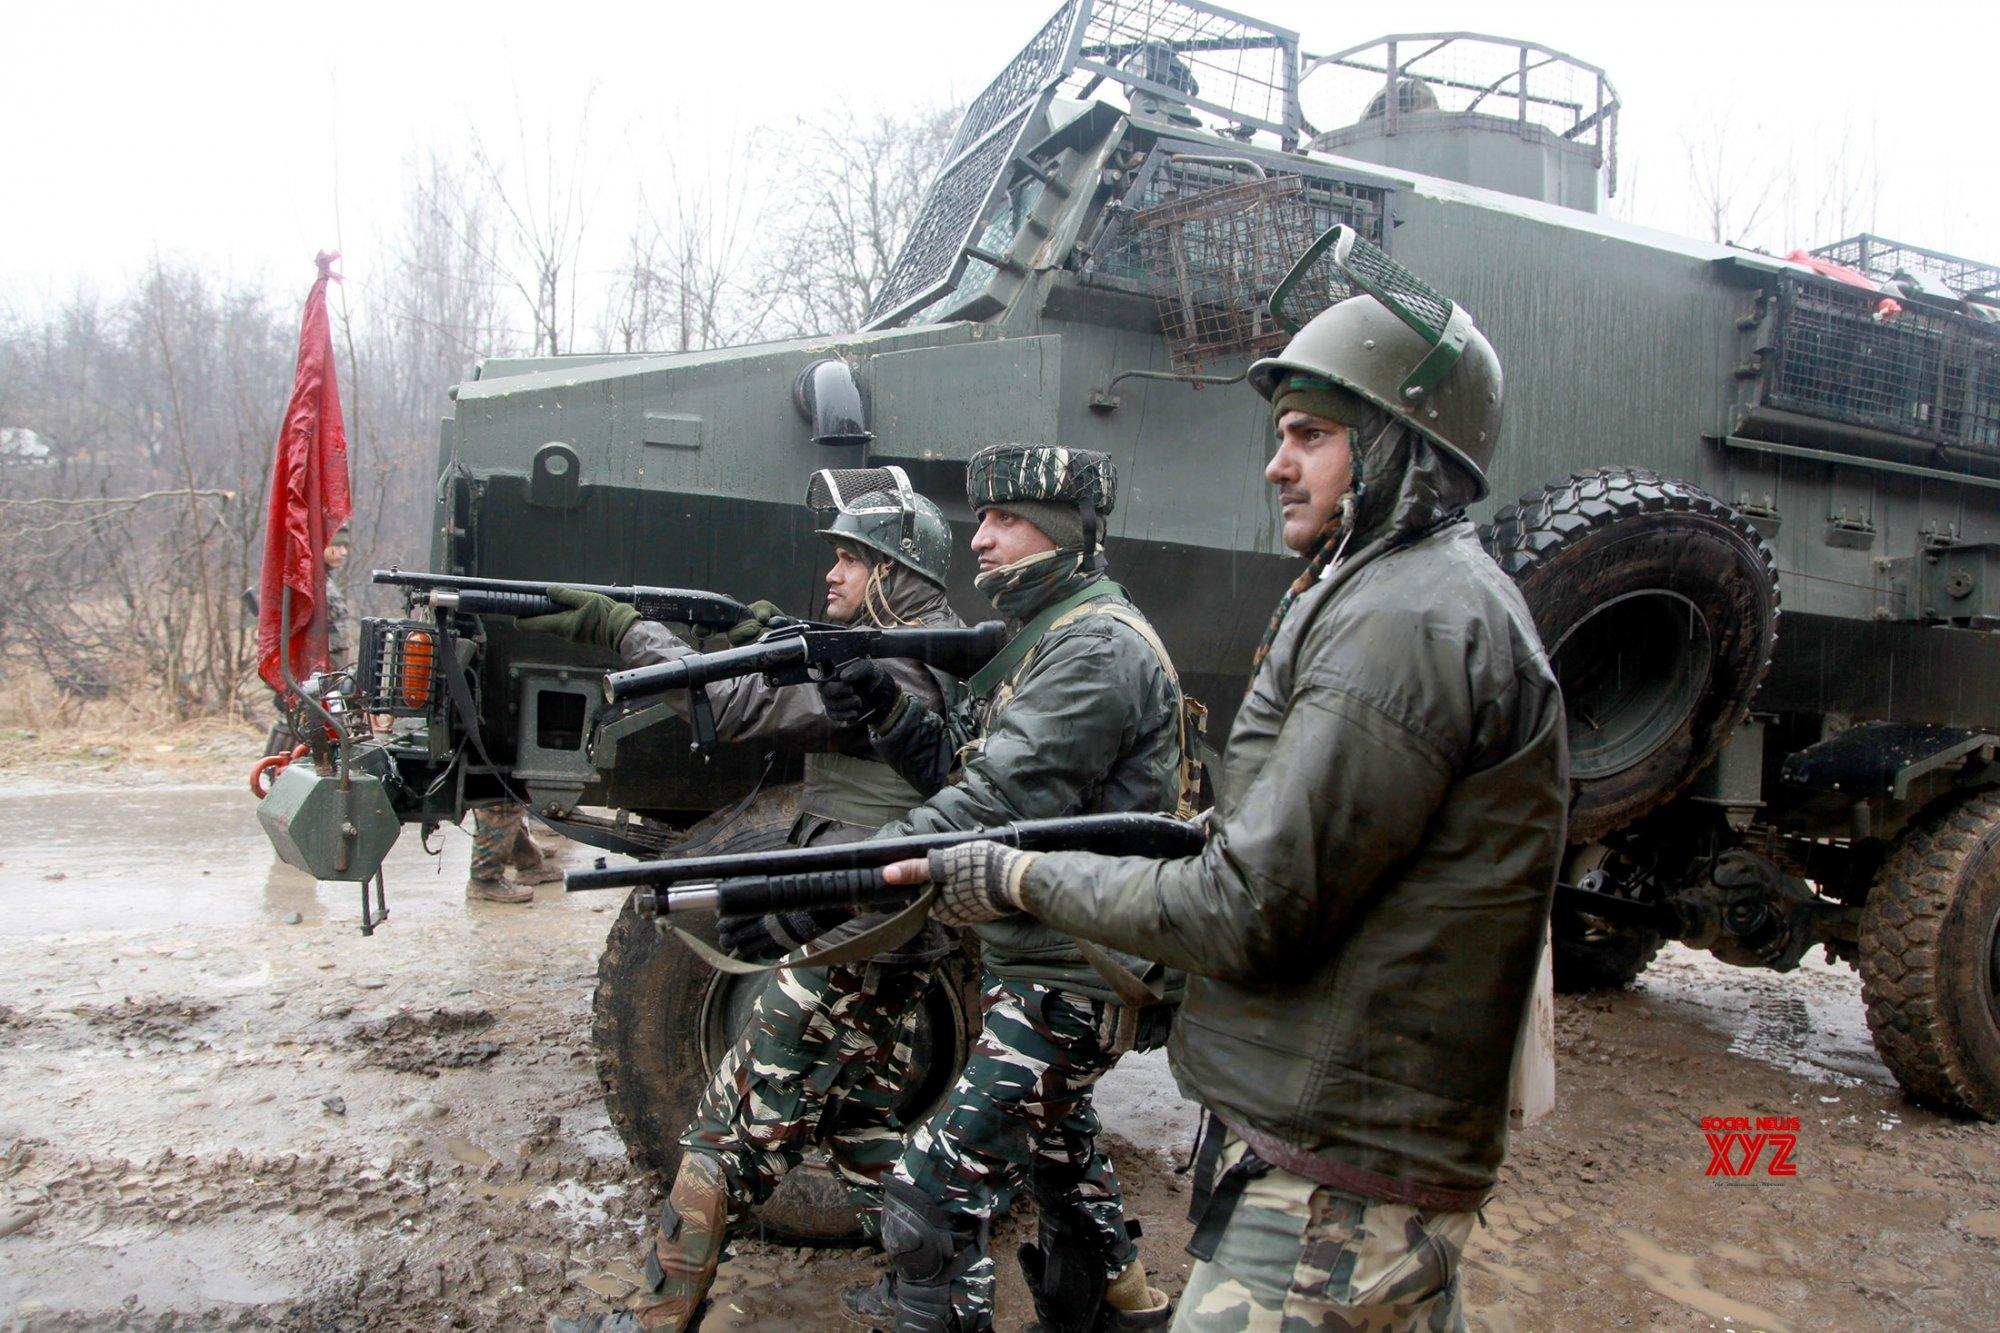 IPS officer's brother among 3 militants killed in Kashmir